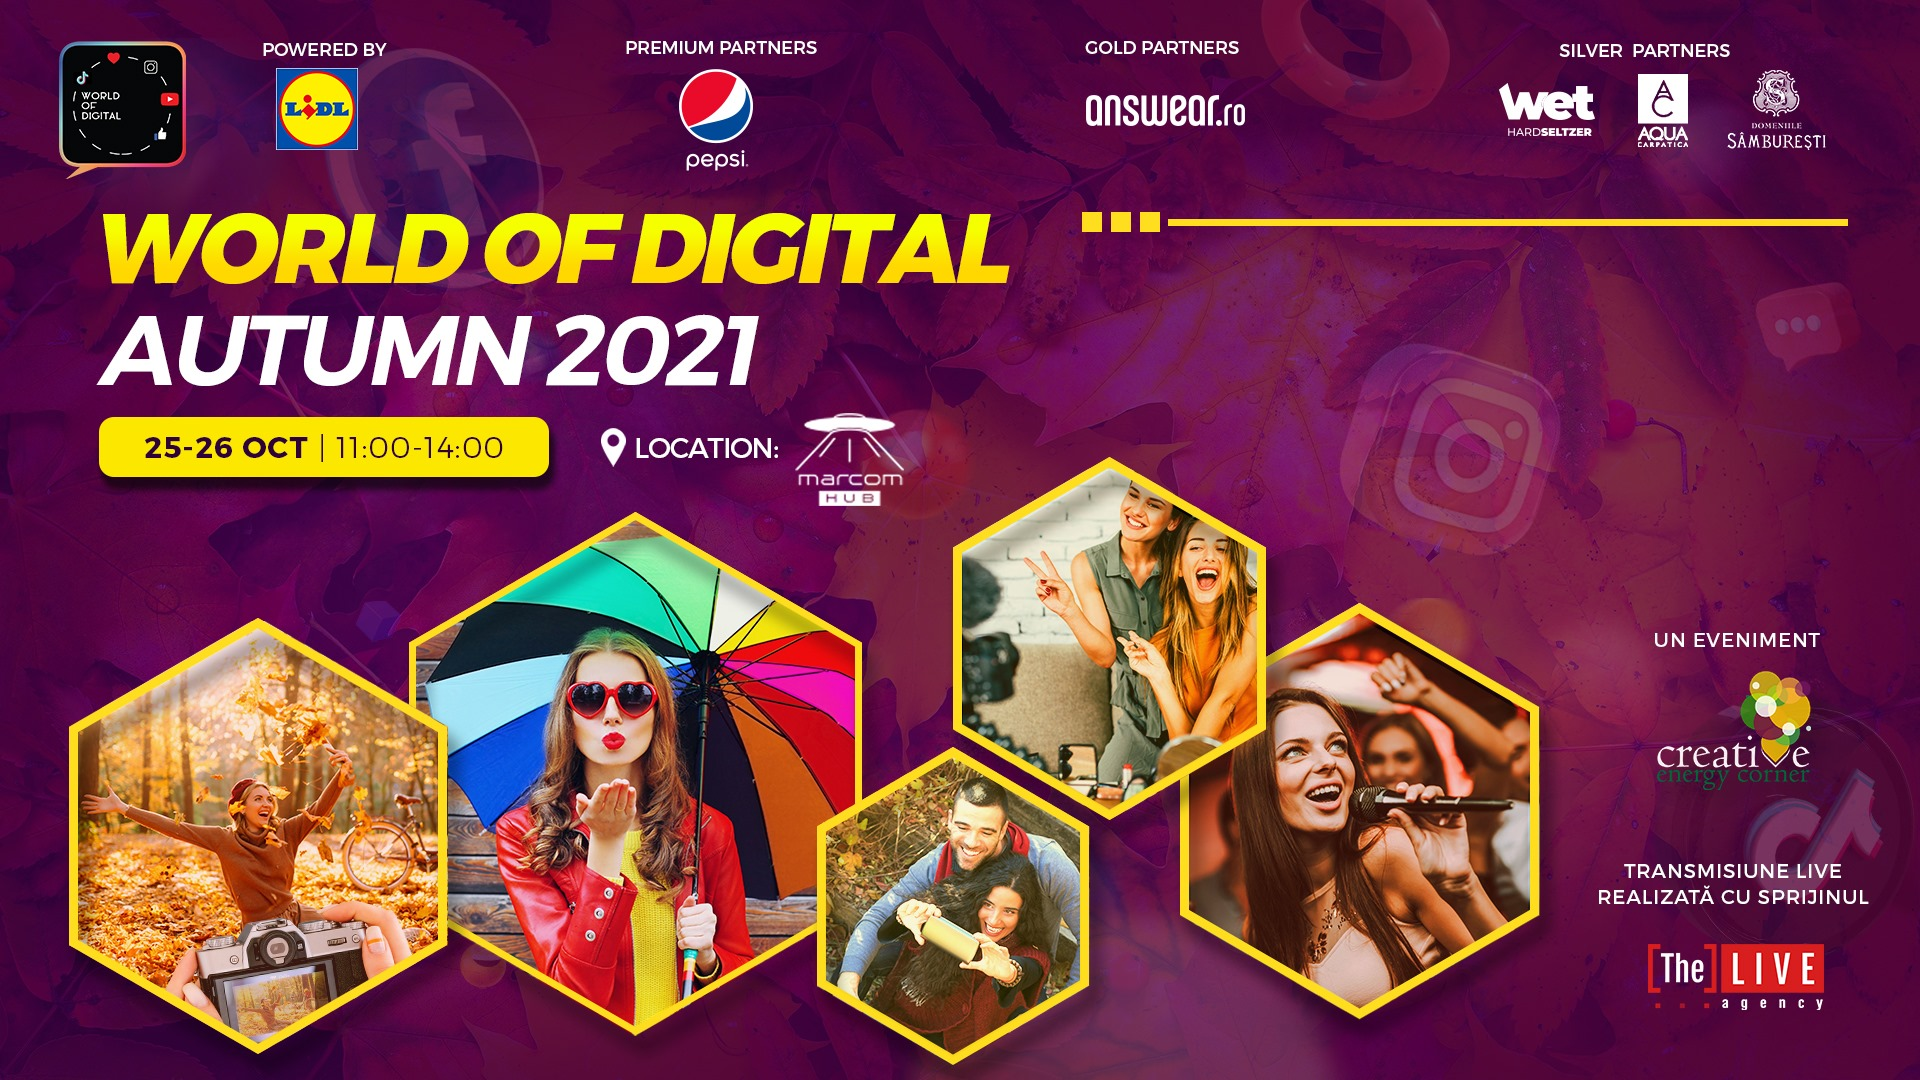 World of Digital Summit